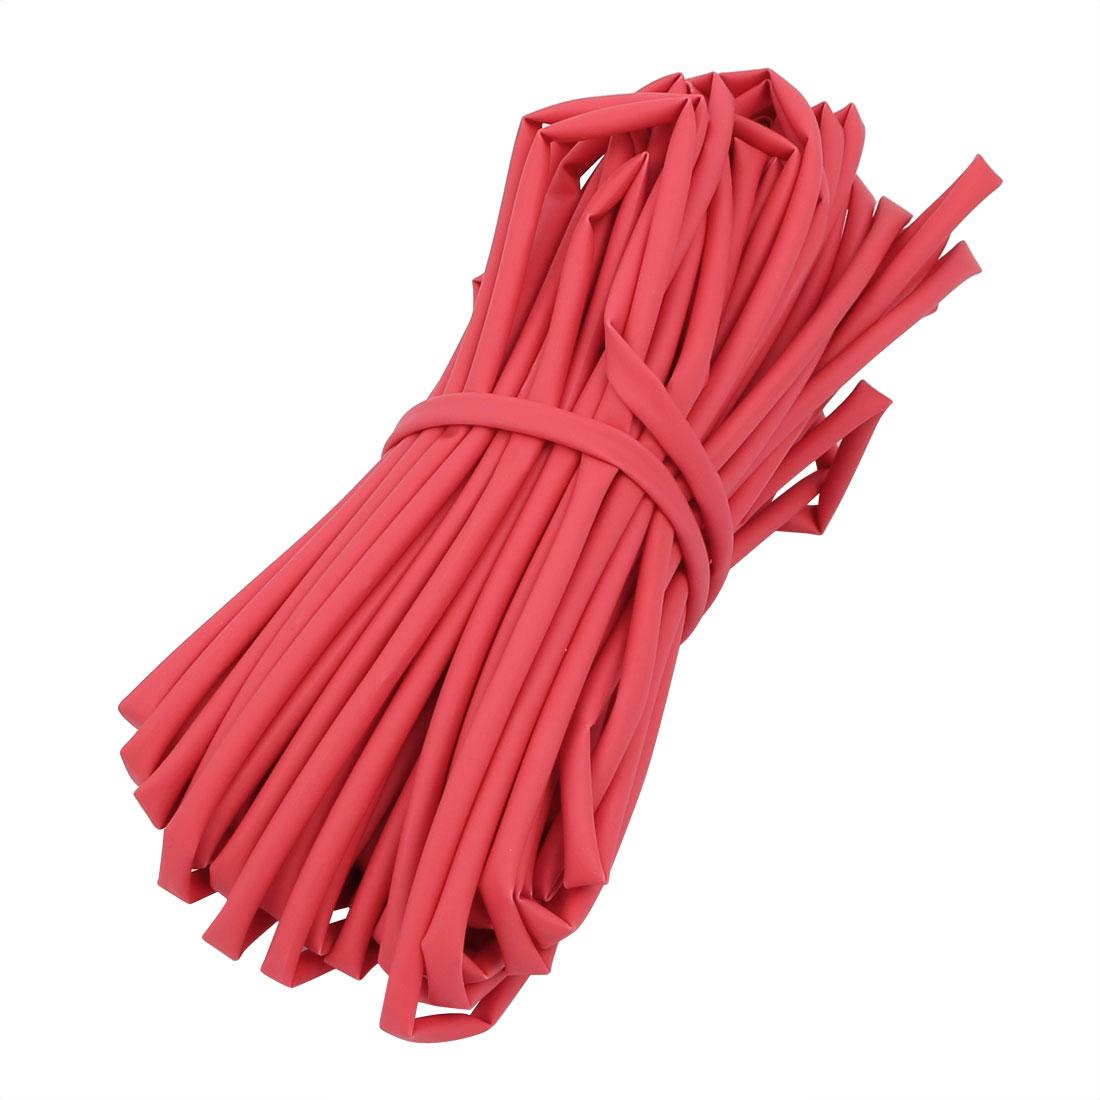 15M Long 2.5mm Inner Dia. Polyolefin Heat Shrinkable Tube Red for Wire Repairing